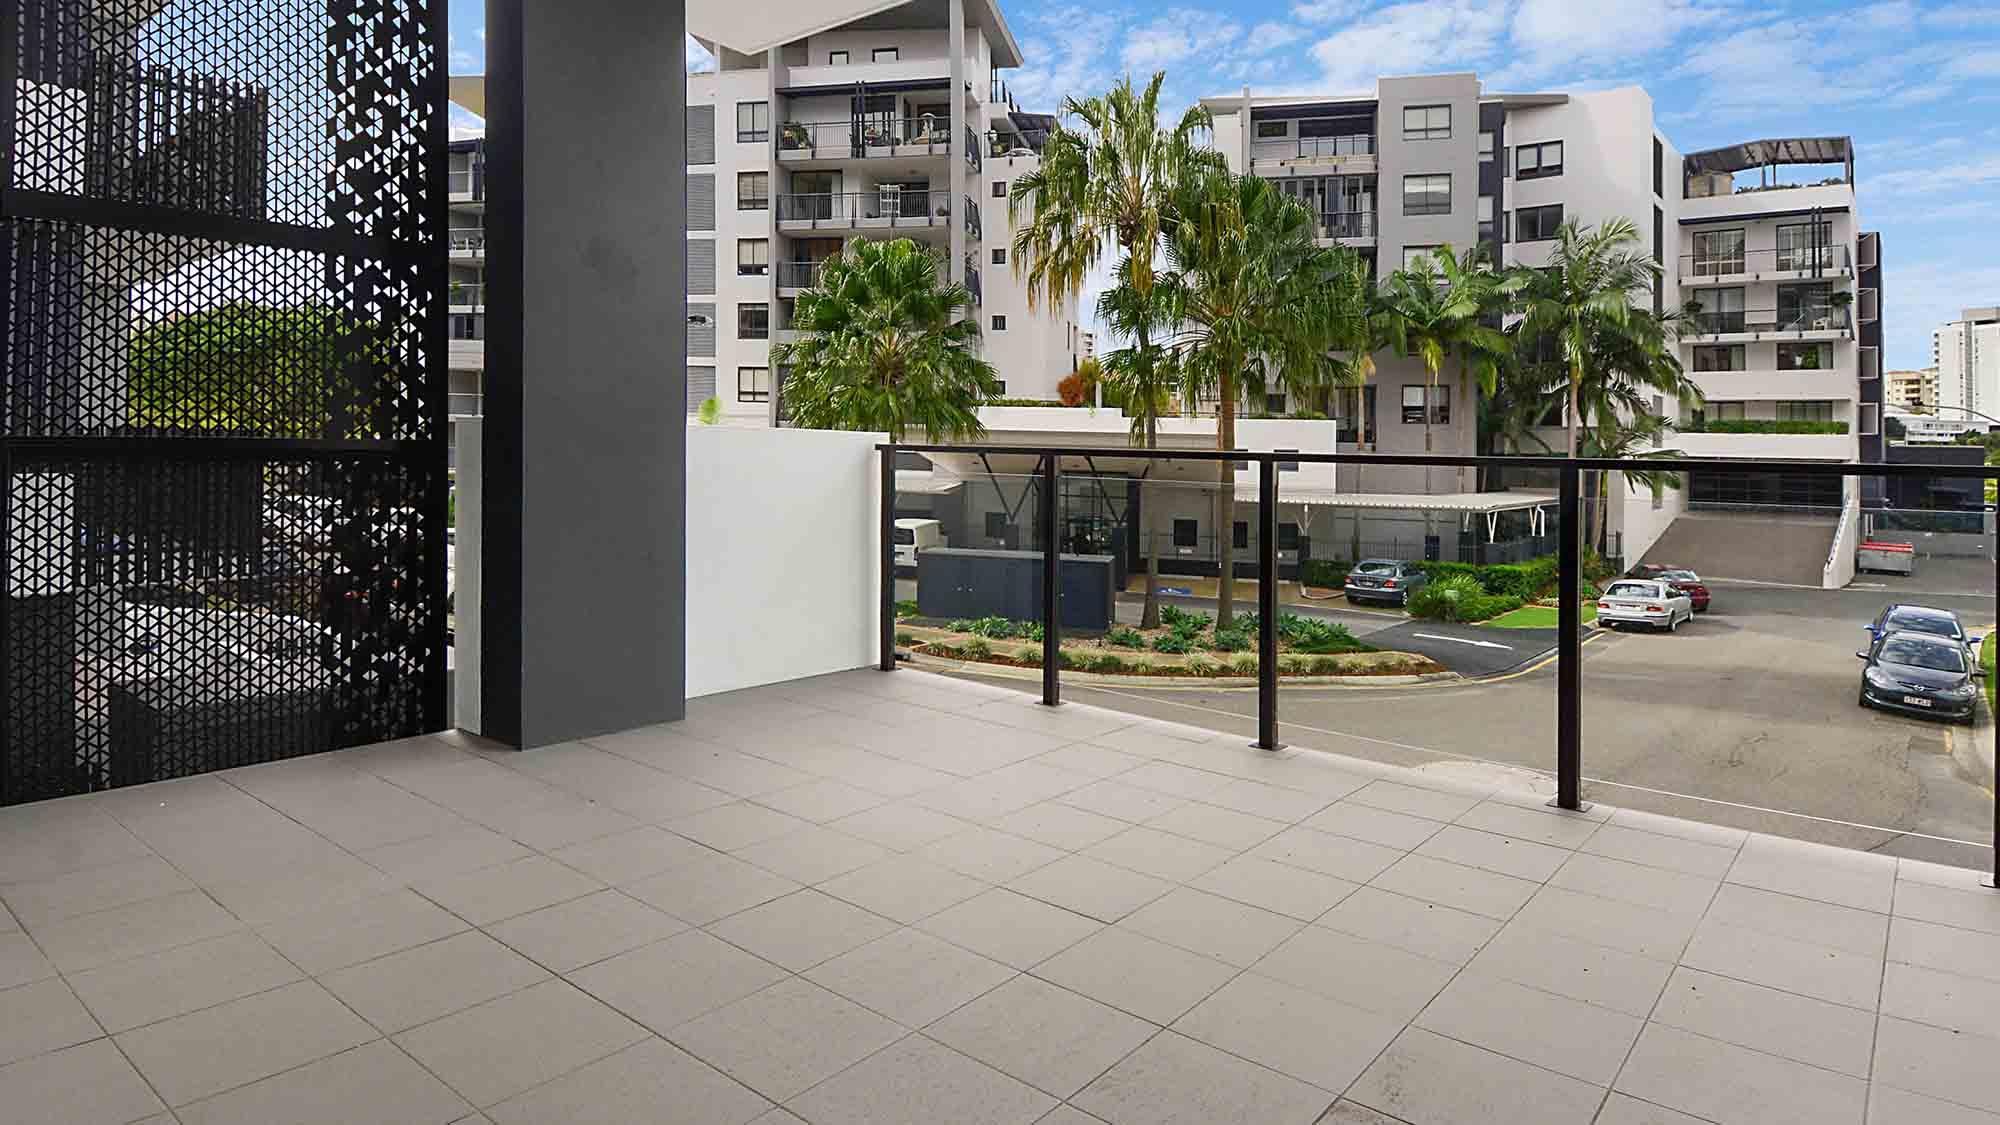 Linc Apartments | Yungaba